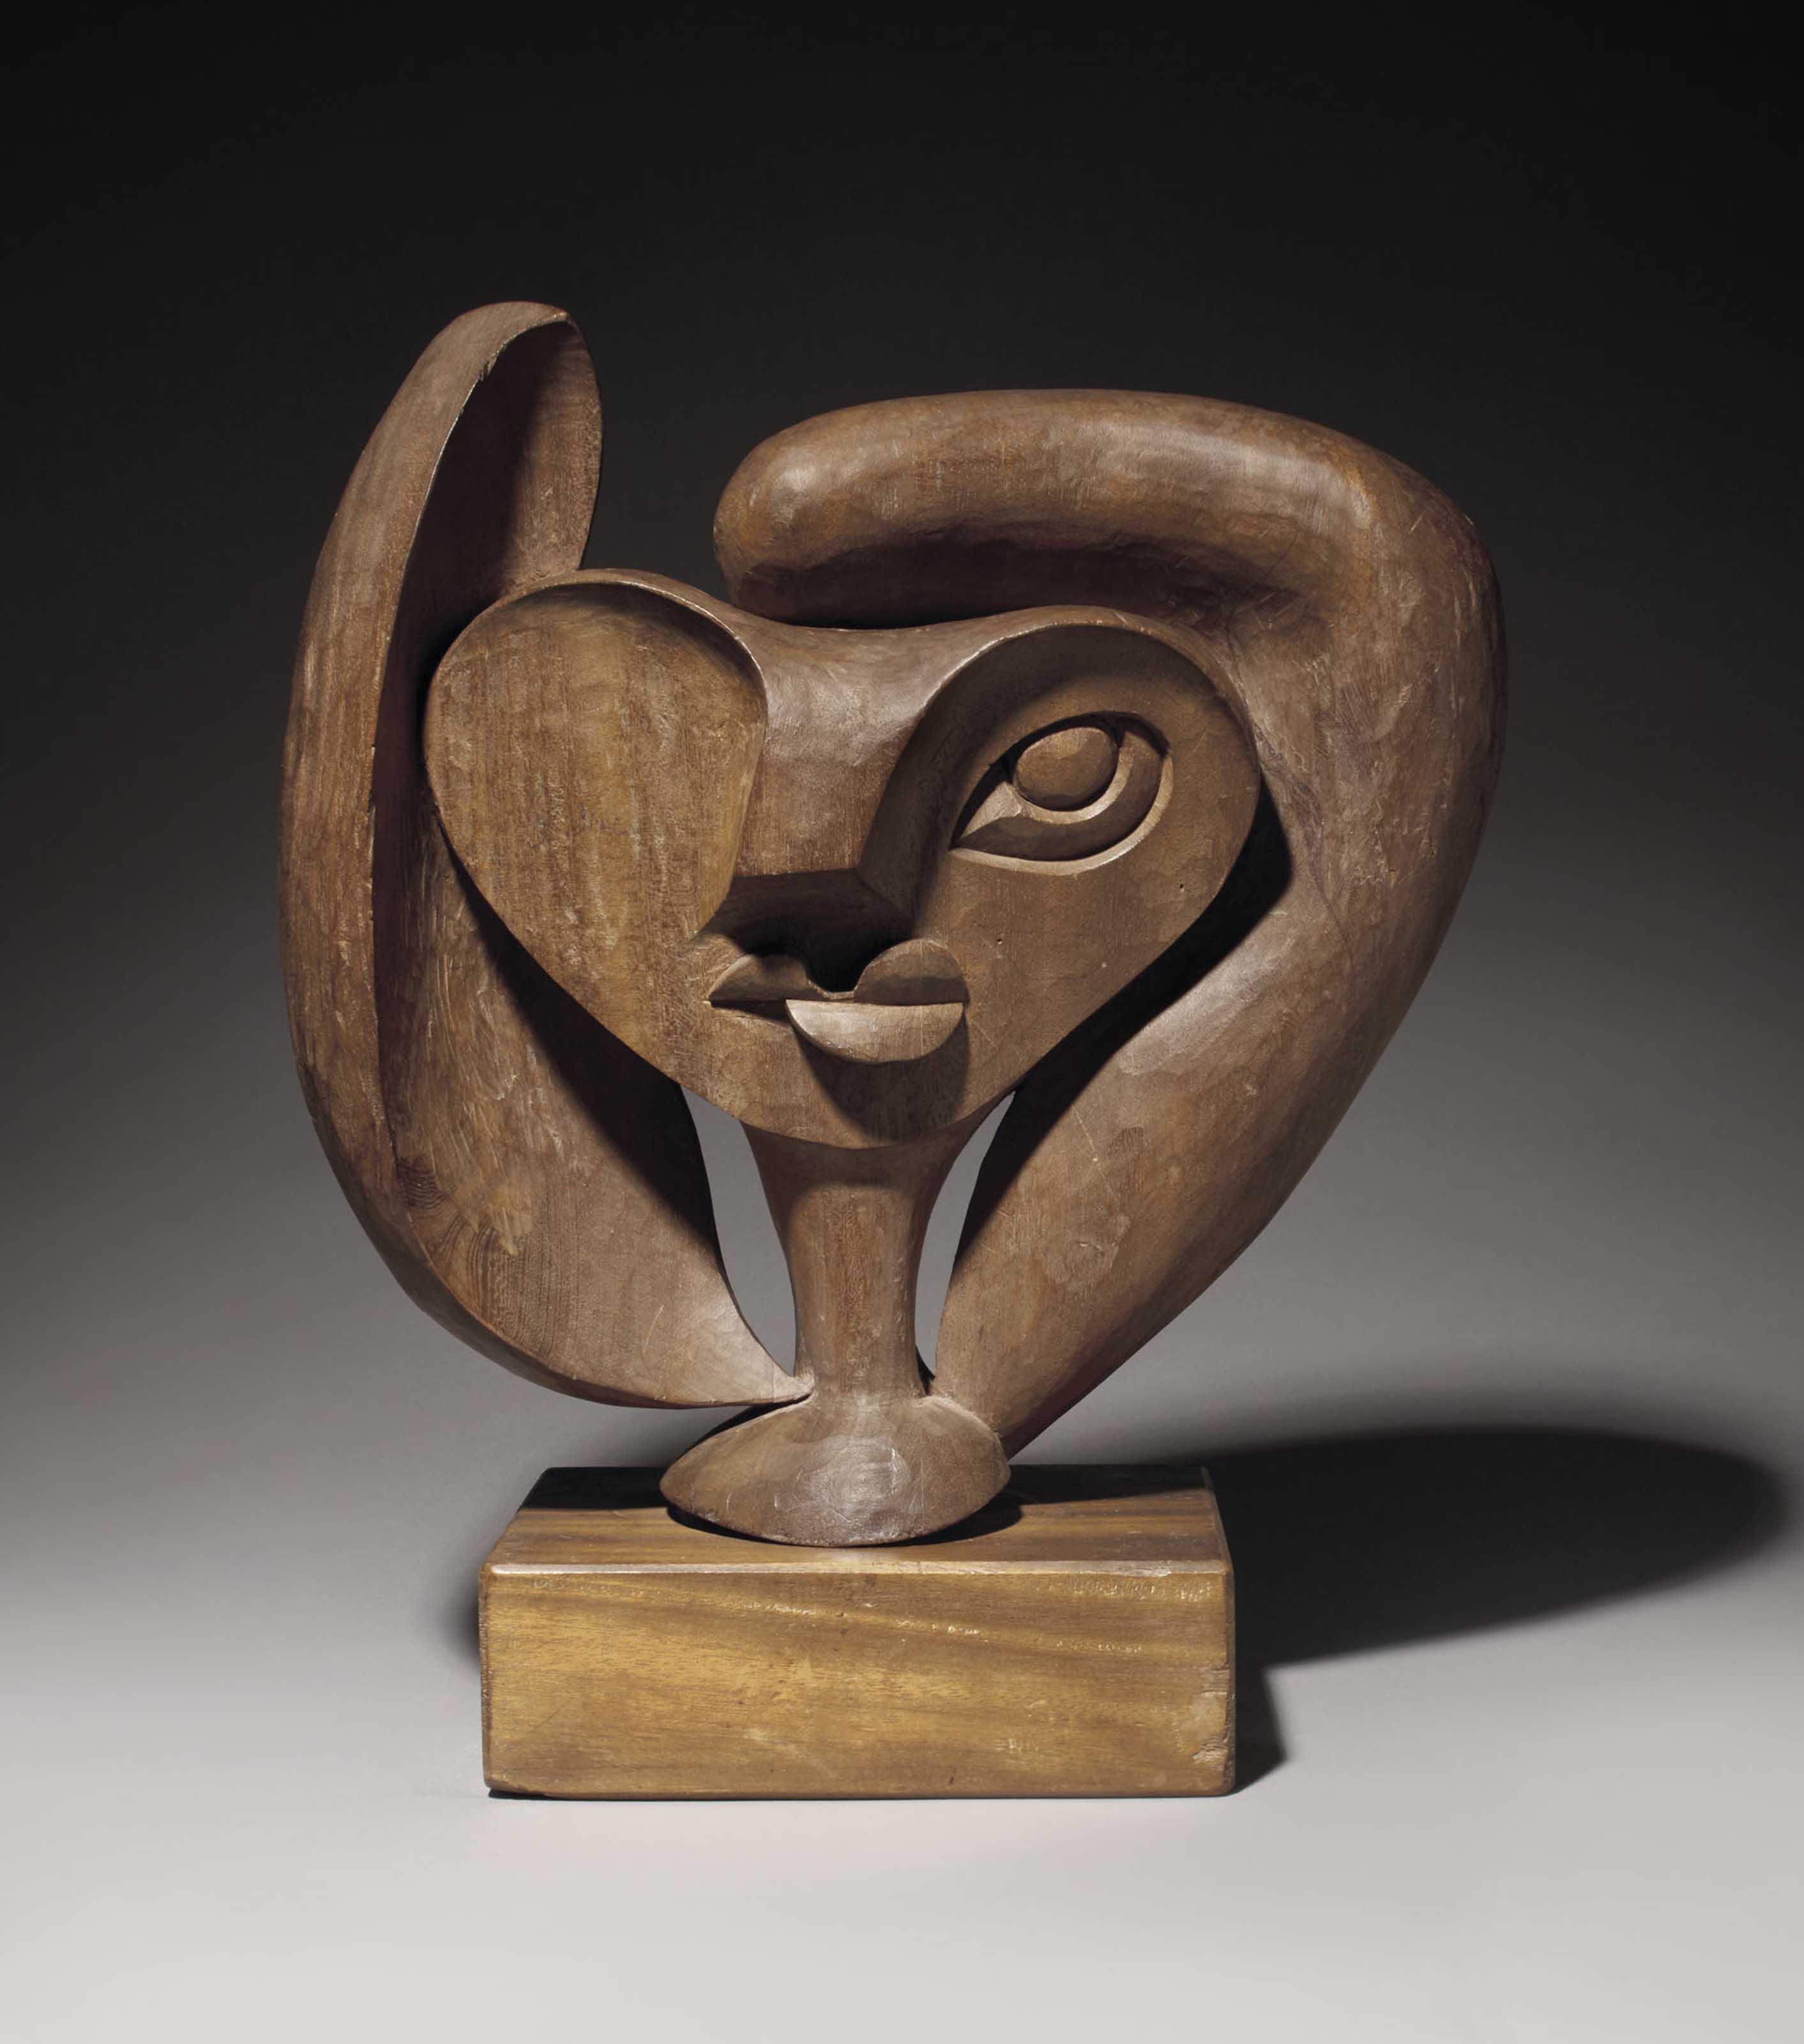 Le Corbusier (Charles-Edouard Jeanneret, 1887-1965) et Joseph Savina (1901-1983)